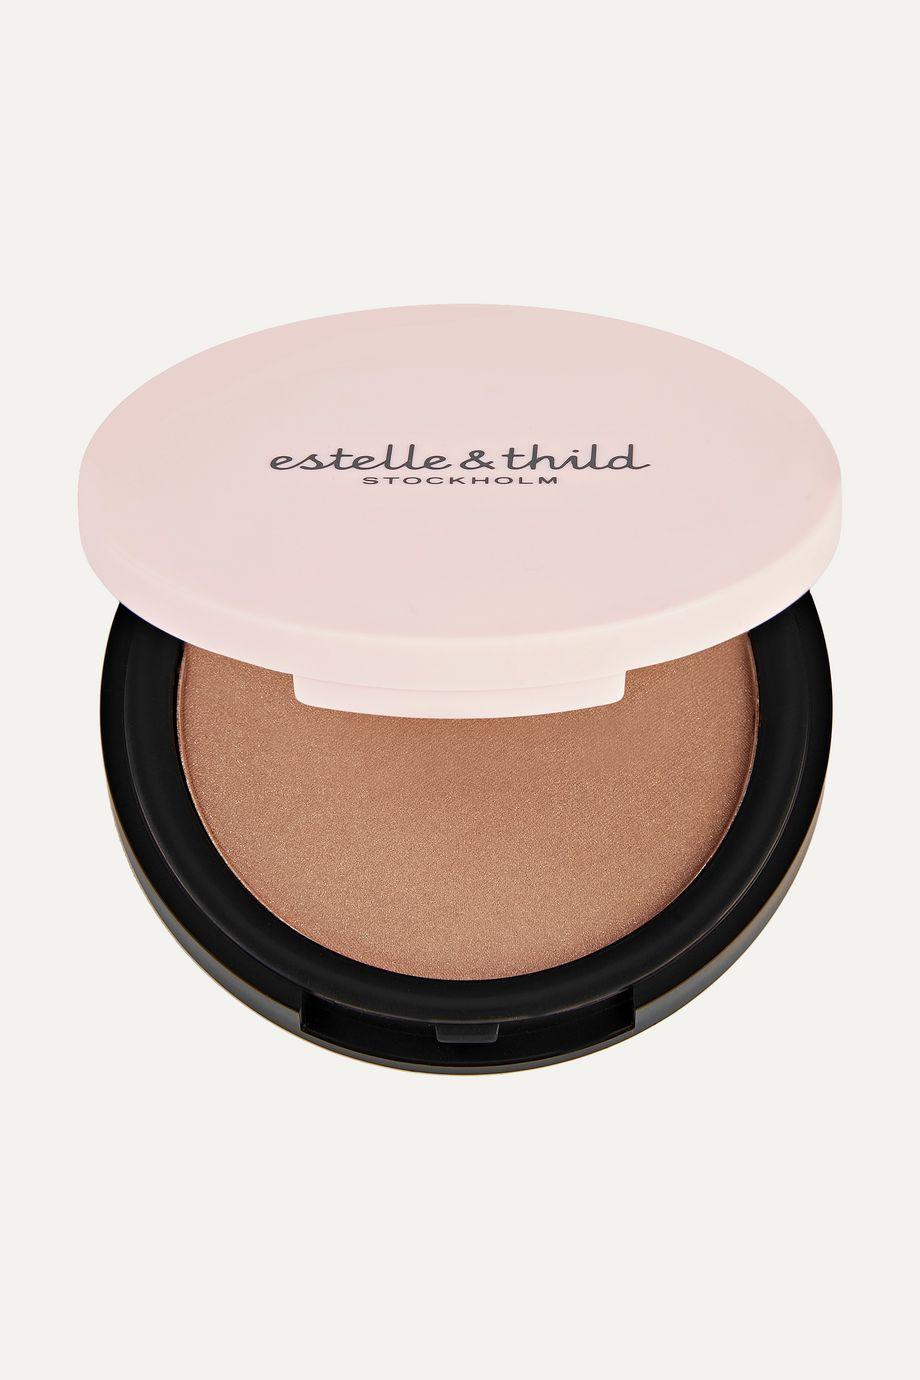 Estelle & Thild BioMineral Healthy Glow Sun Powder - Sheer Shimmer